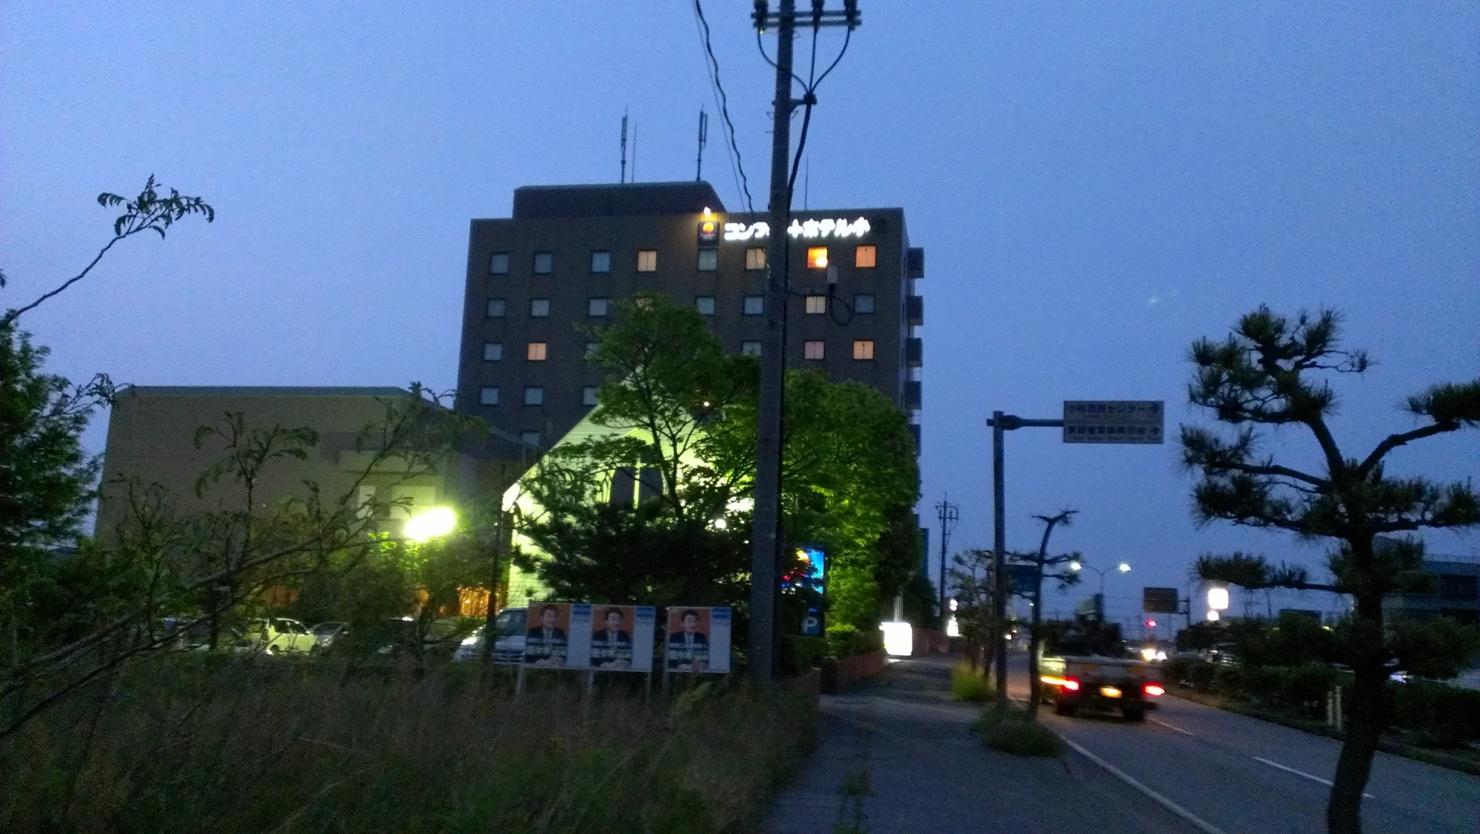 f:id:ToshUeno:20140524191724j:plain